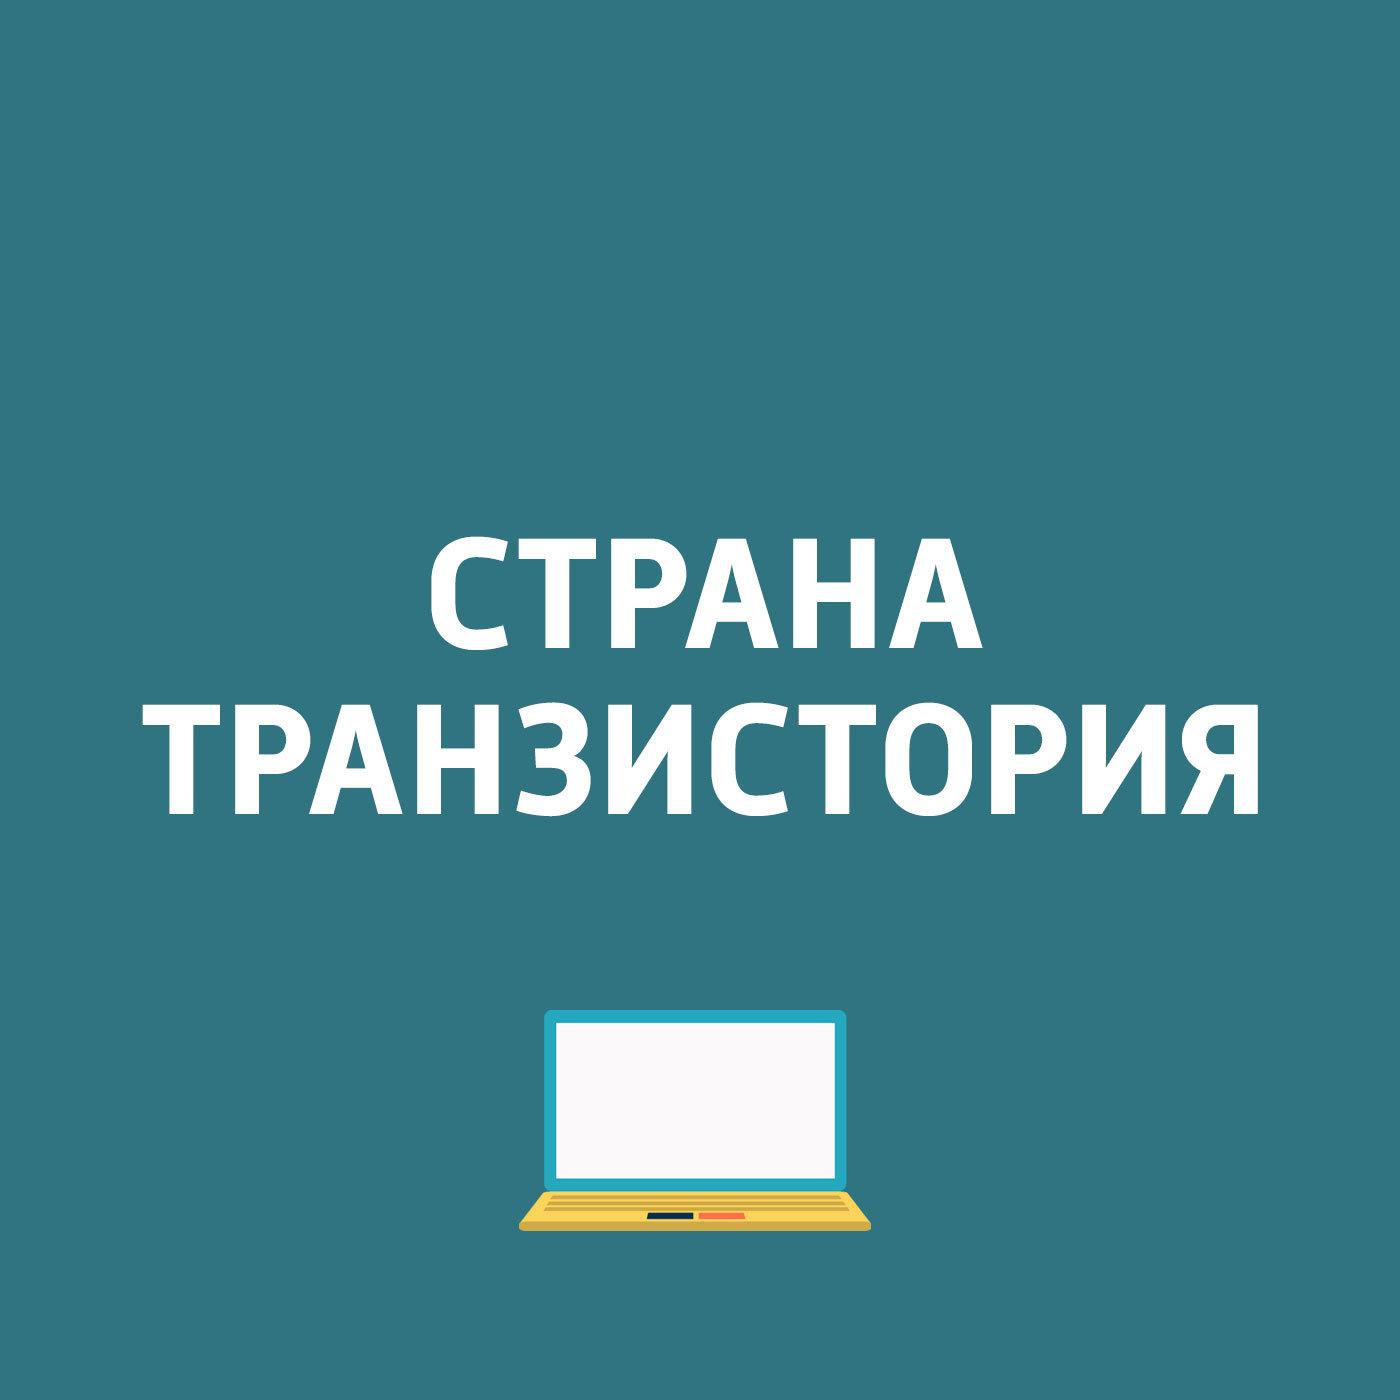 Фото - Картаев Павел Lenovo представила ноутбук ThinkPad X1 Extreme и Yoga Book C930; Шлем виртуальной реальности на платформе Windows Mixed Reality картаев павел выставка ifa 2018 каких новинок ждать